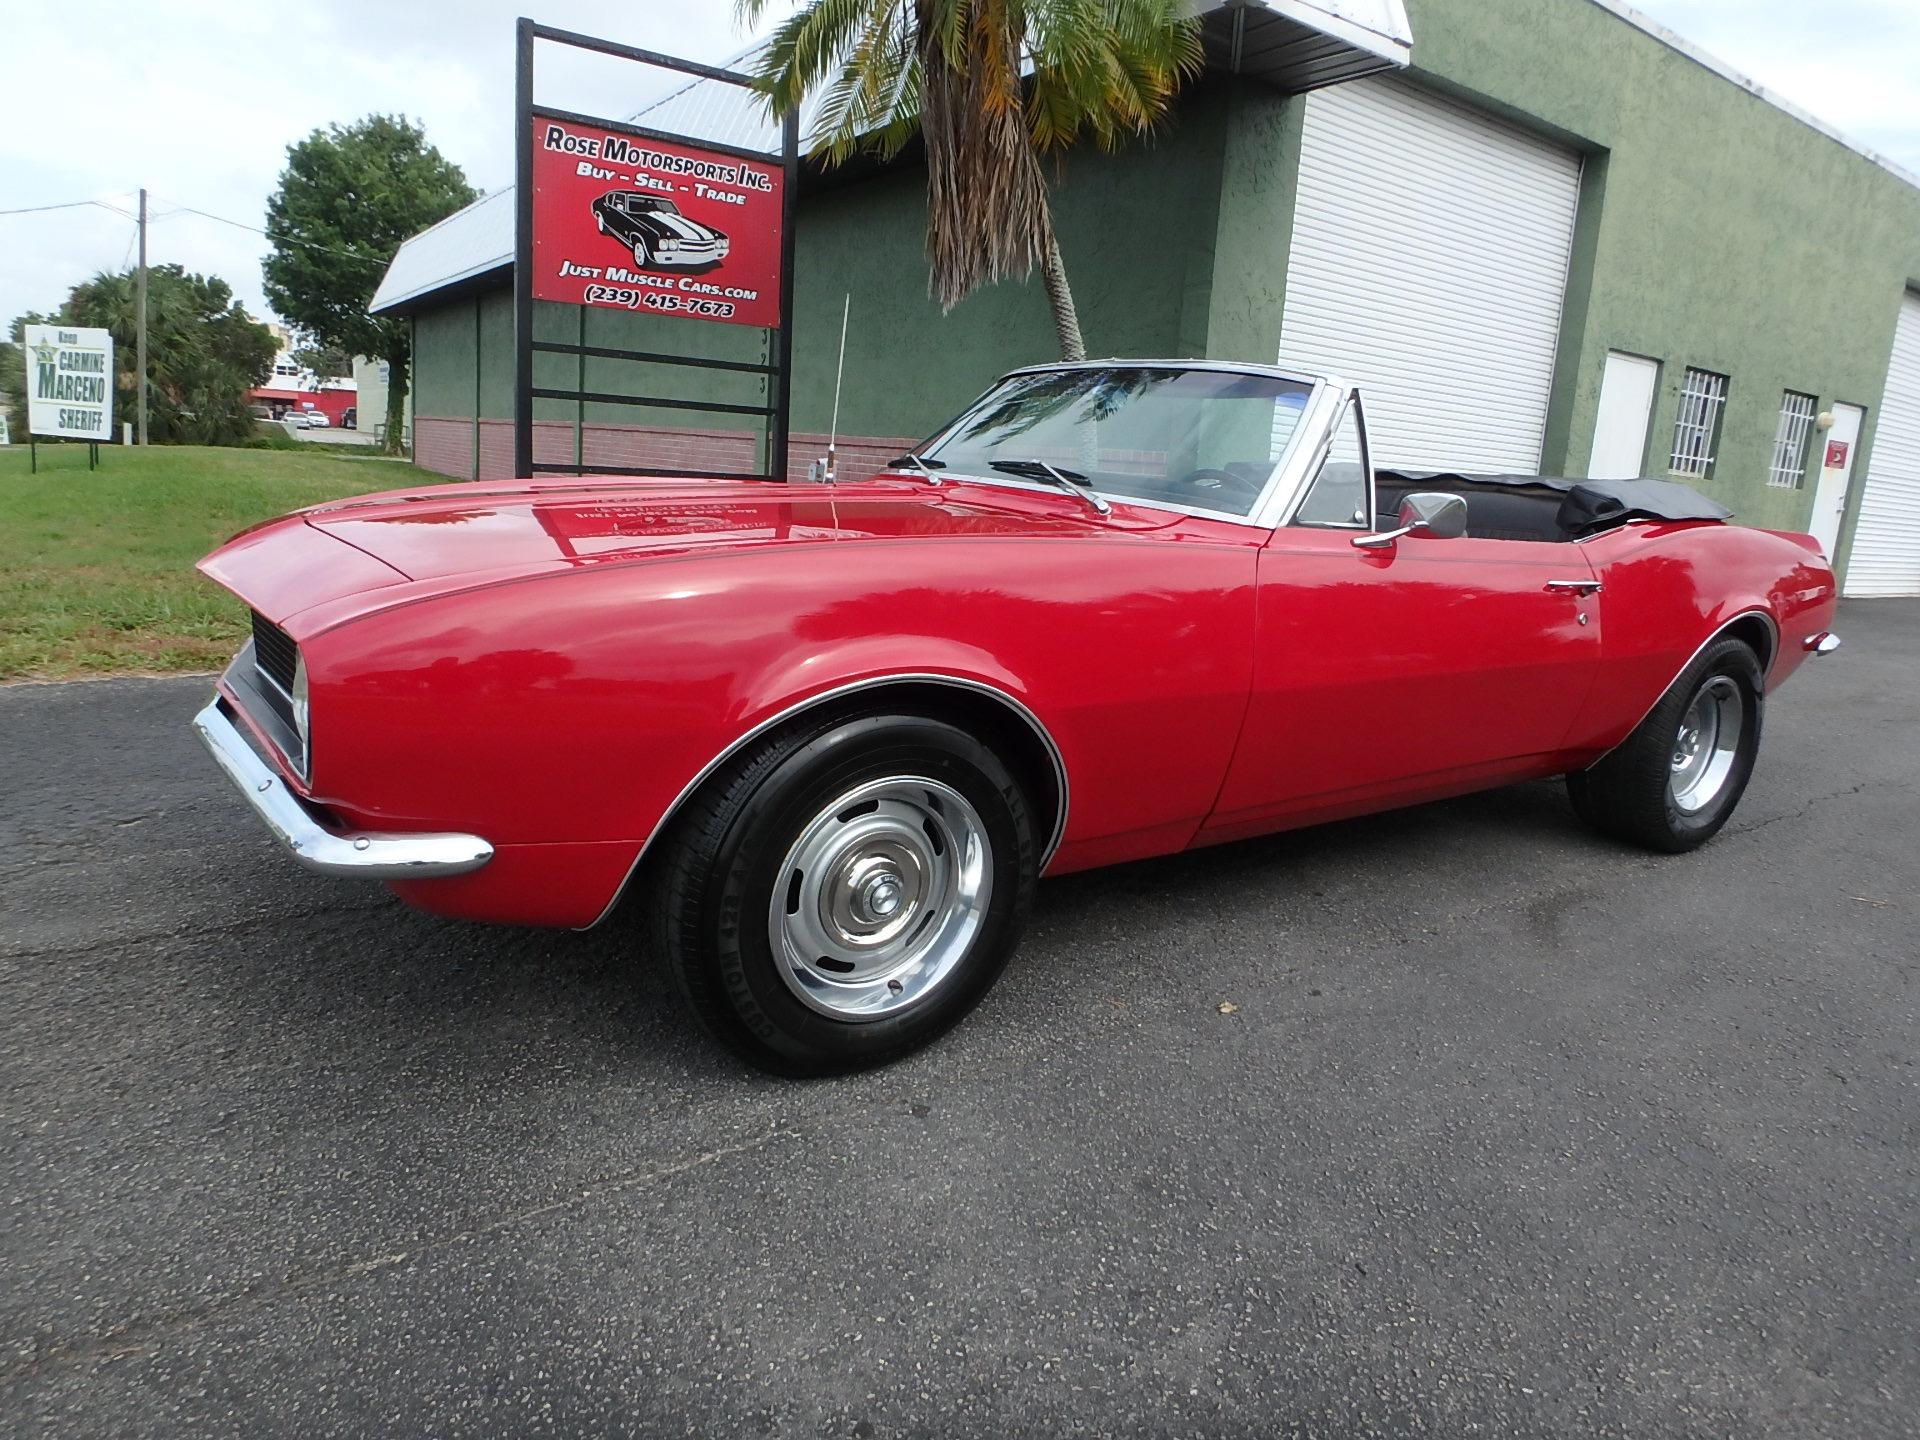 Used 1967 Chevy Camaro Convertible